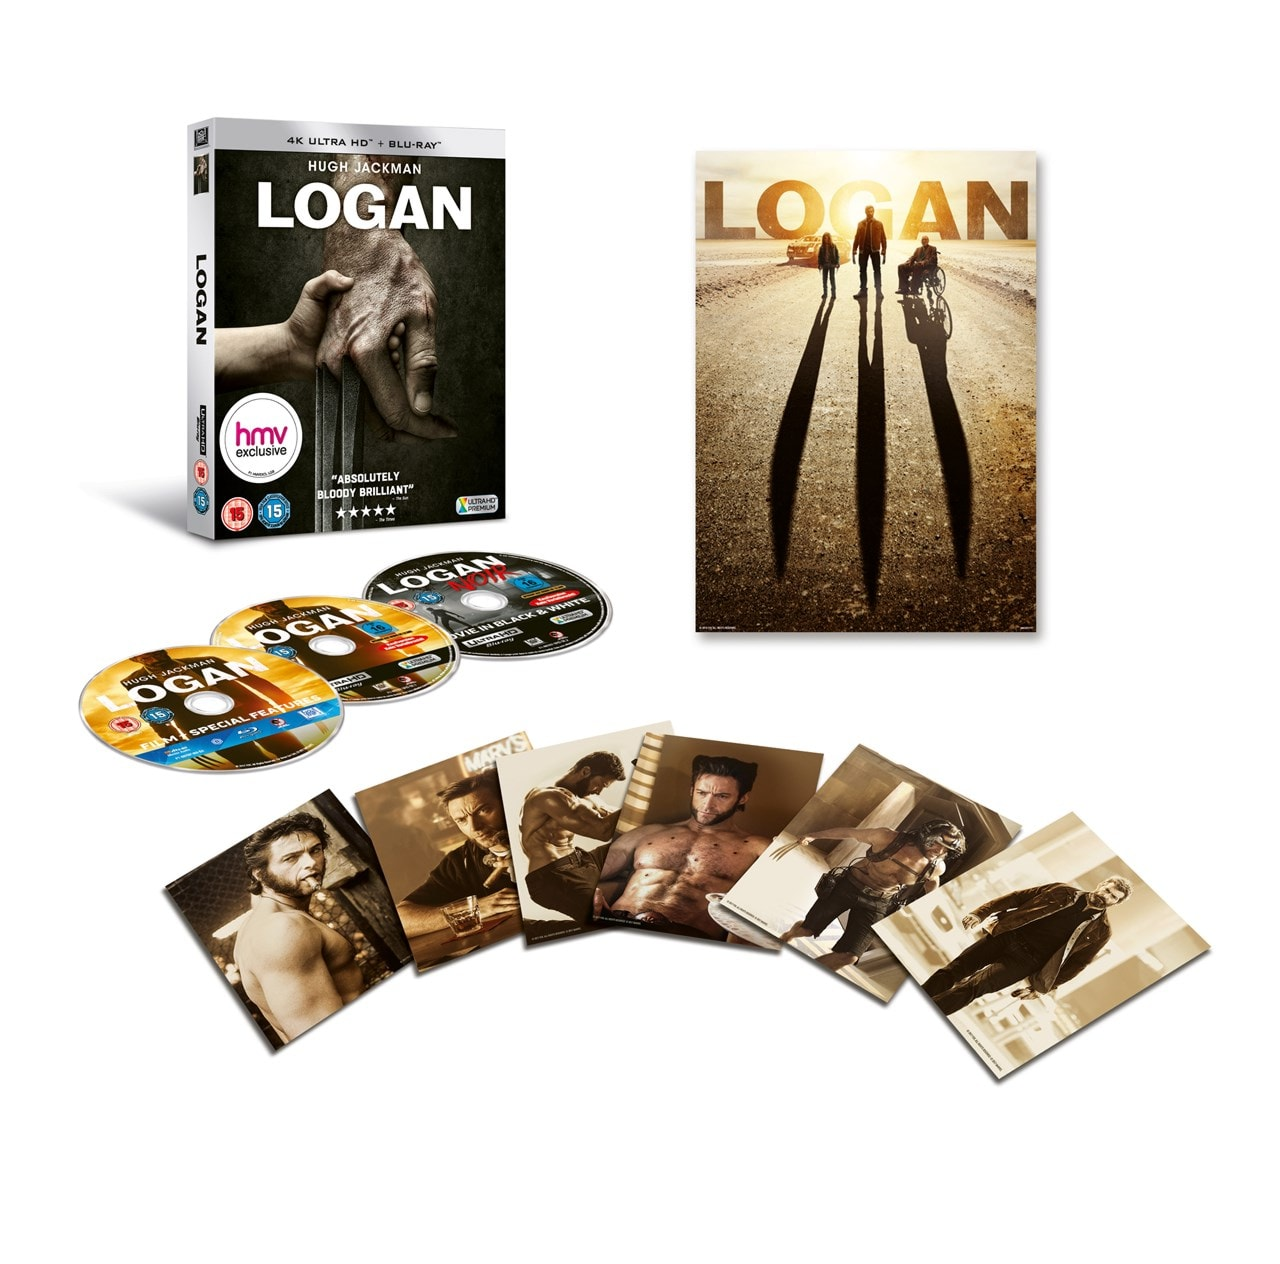 Logan (hmv Exclusive) - 3